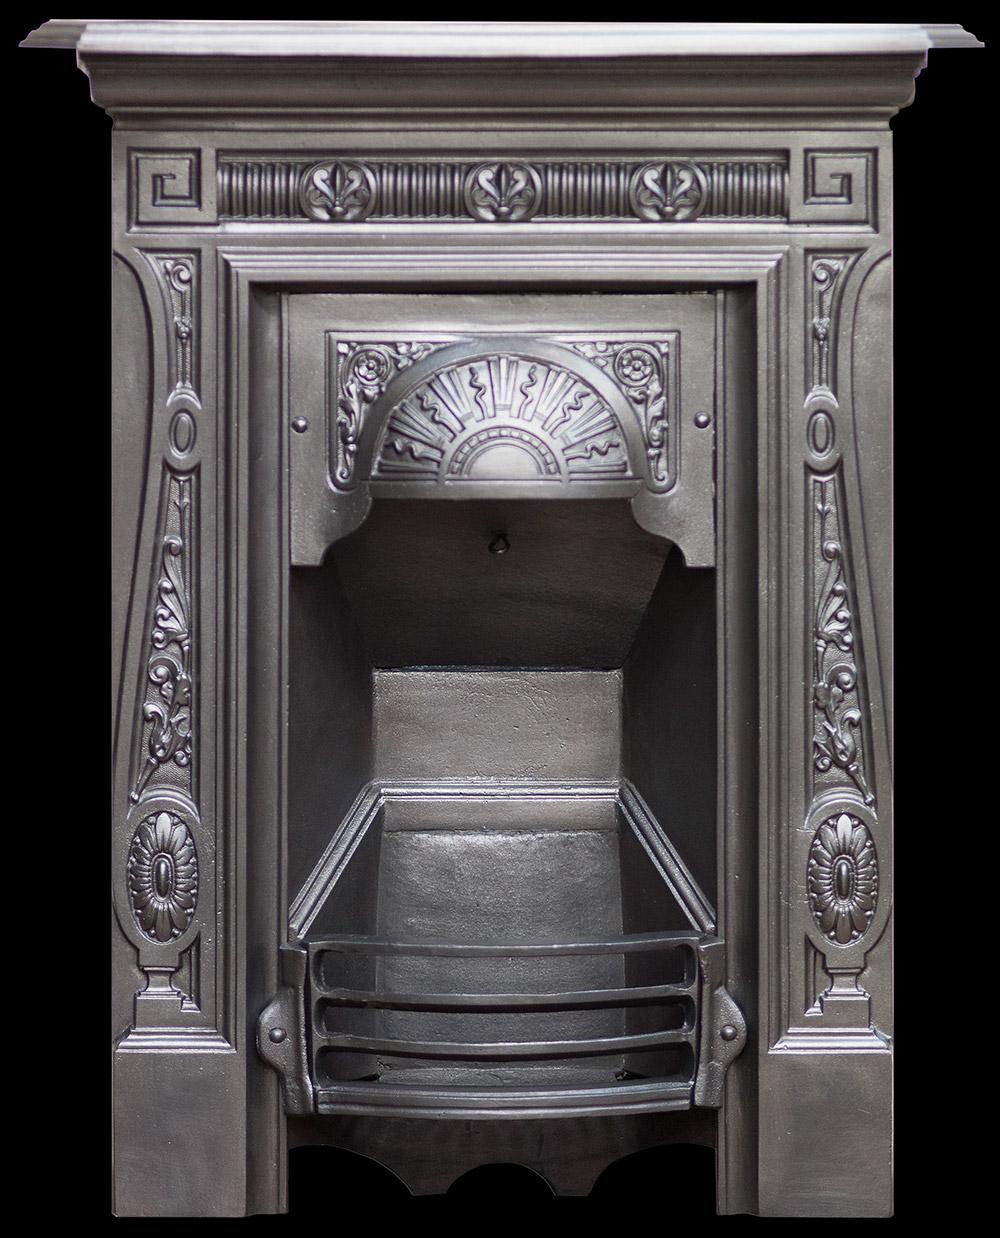 Antique Vintage Bedroom Fireplace: The Antique Fireplace Restoration Company